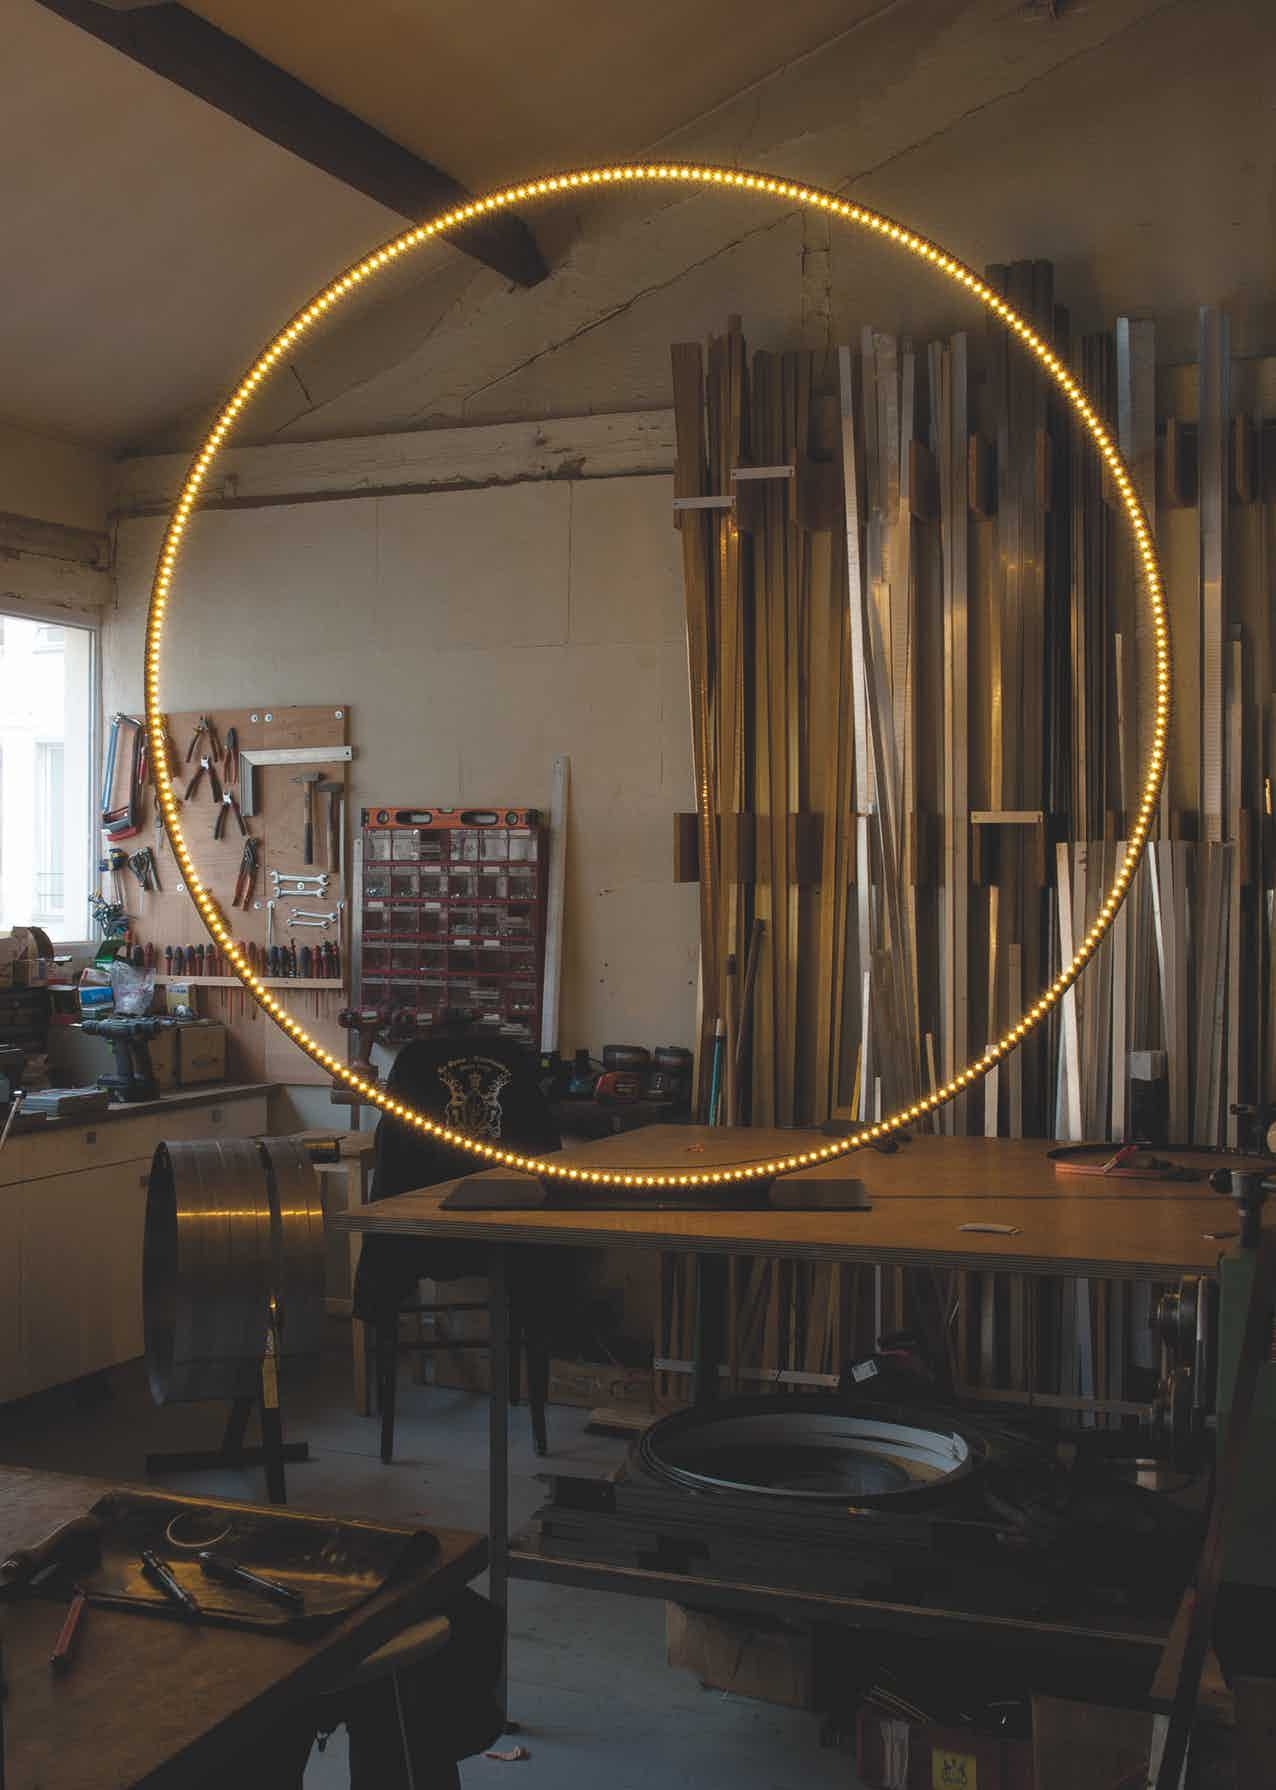 Le-deun-luminaires-giga-floor-lamp-work-table-haute-living